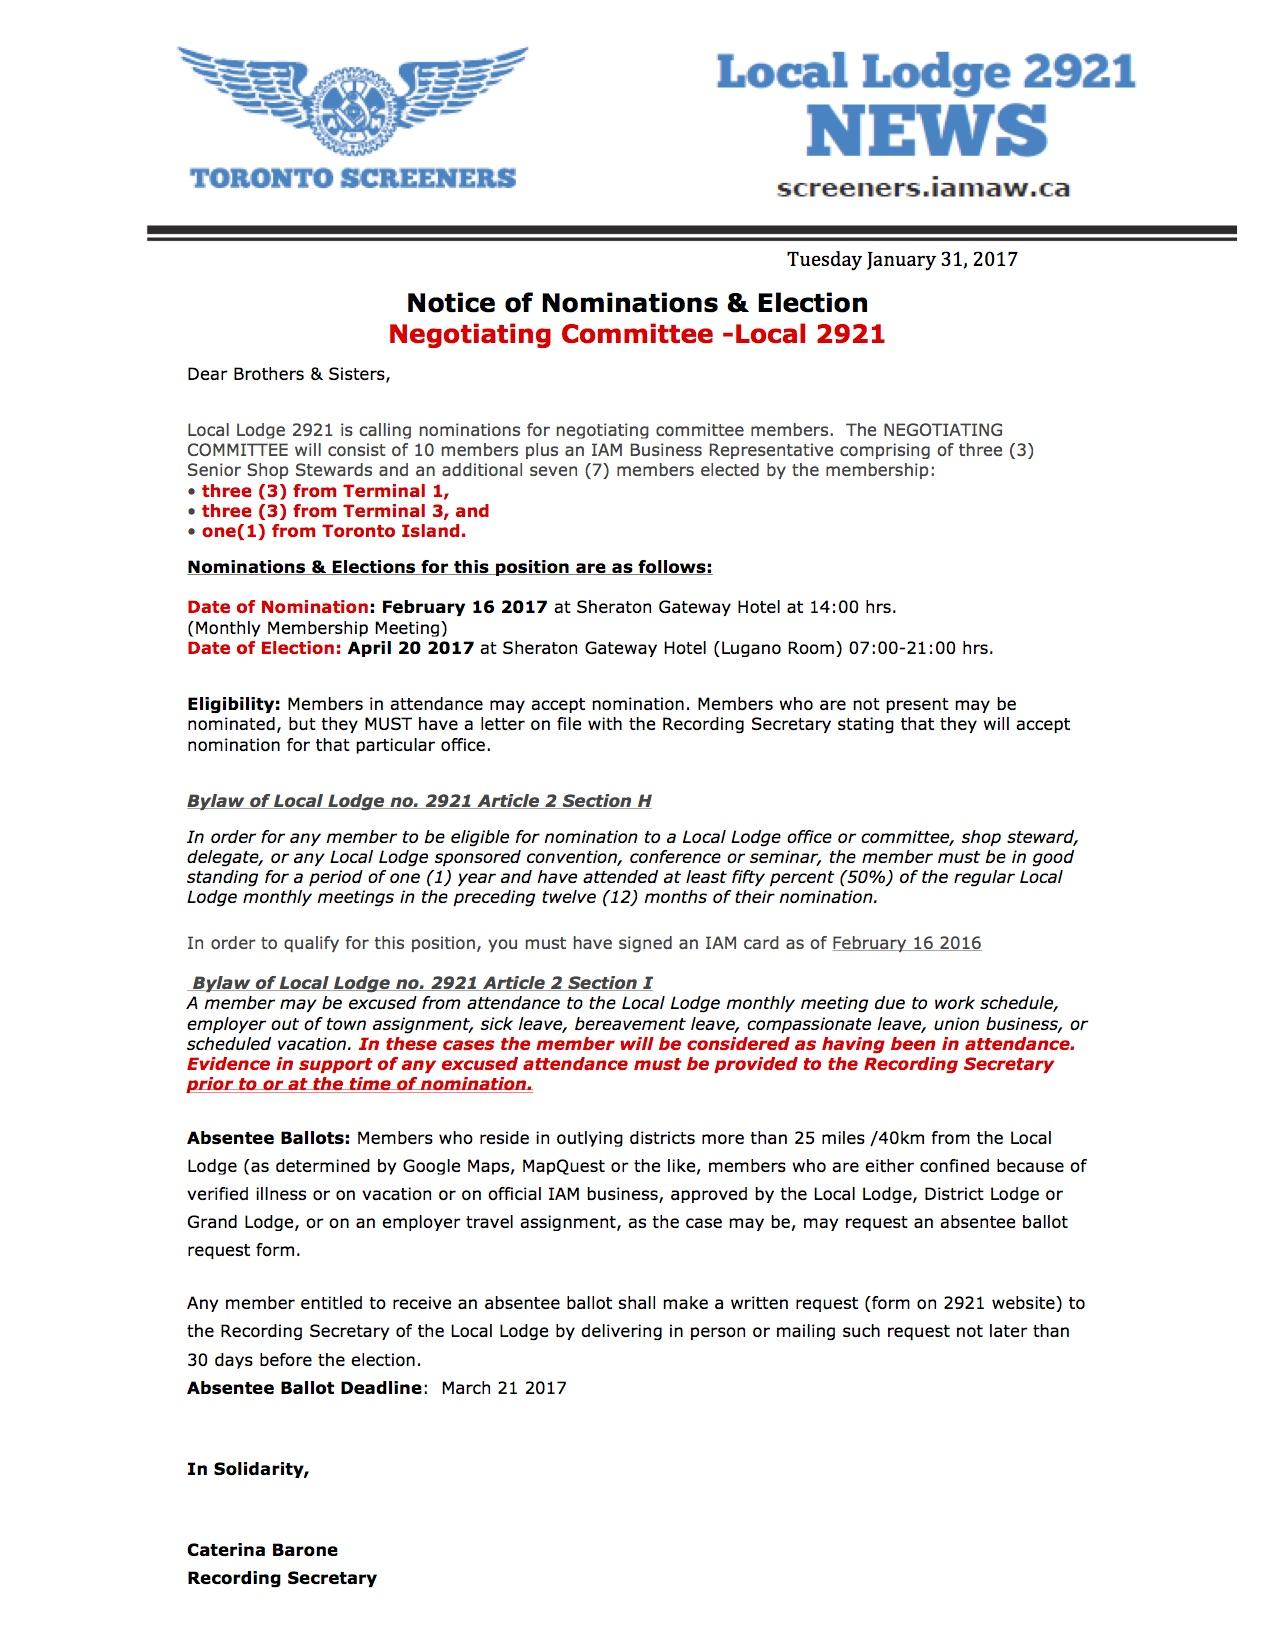 Notice-Nominations CBA Negotiations Committee